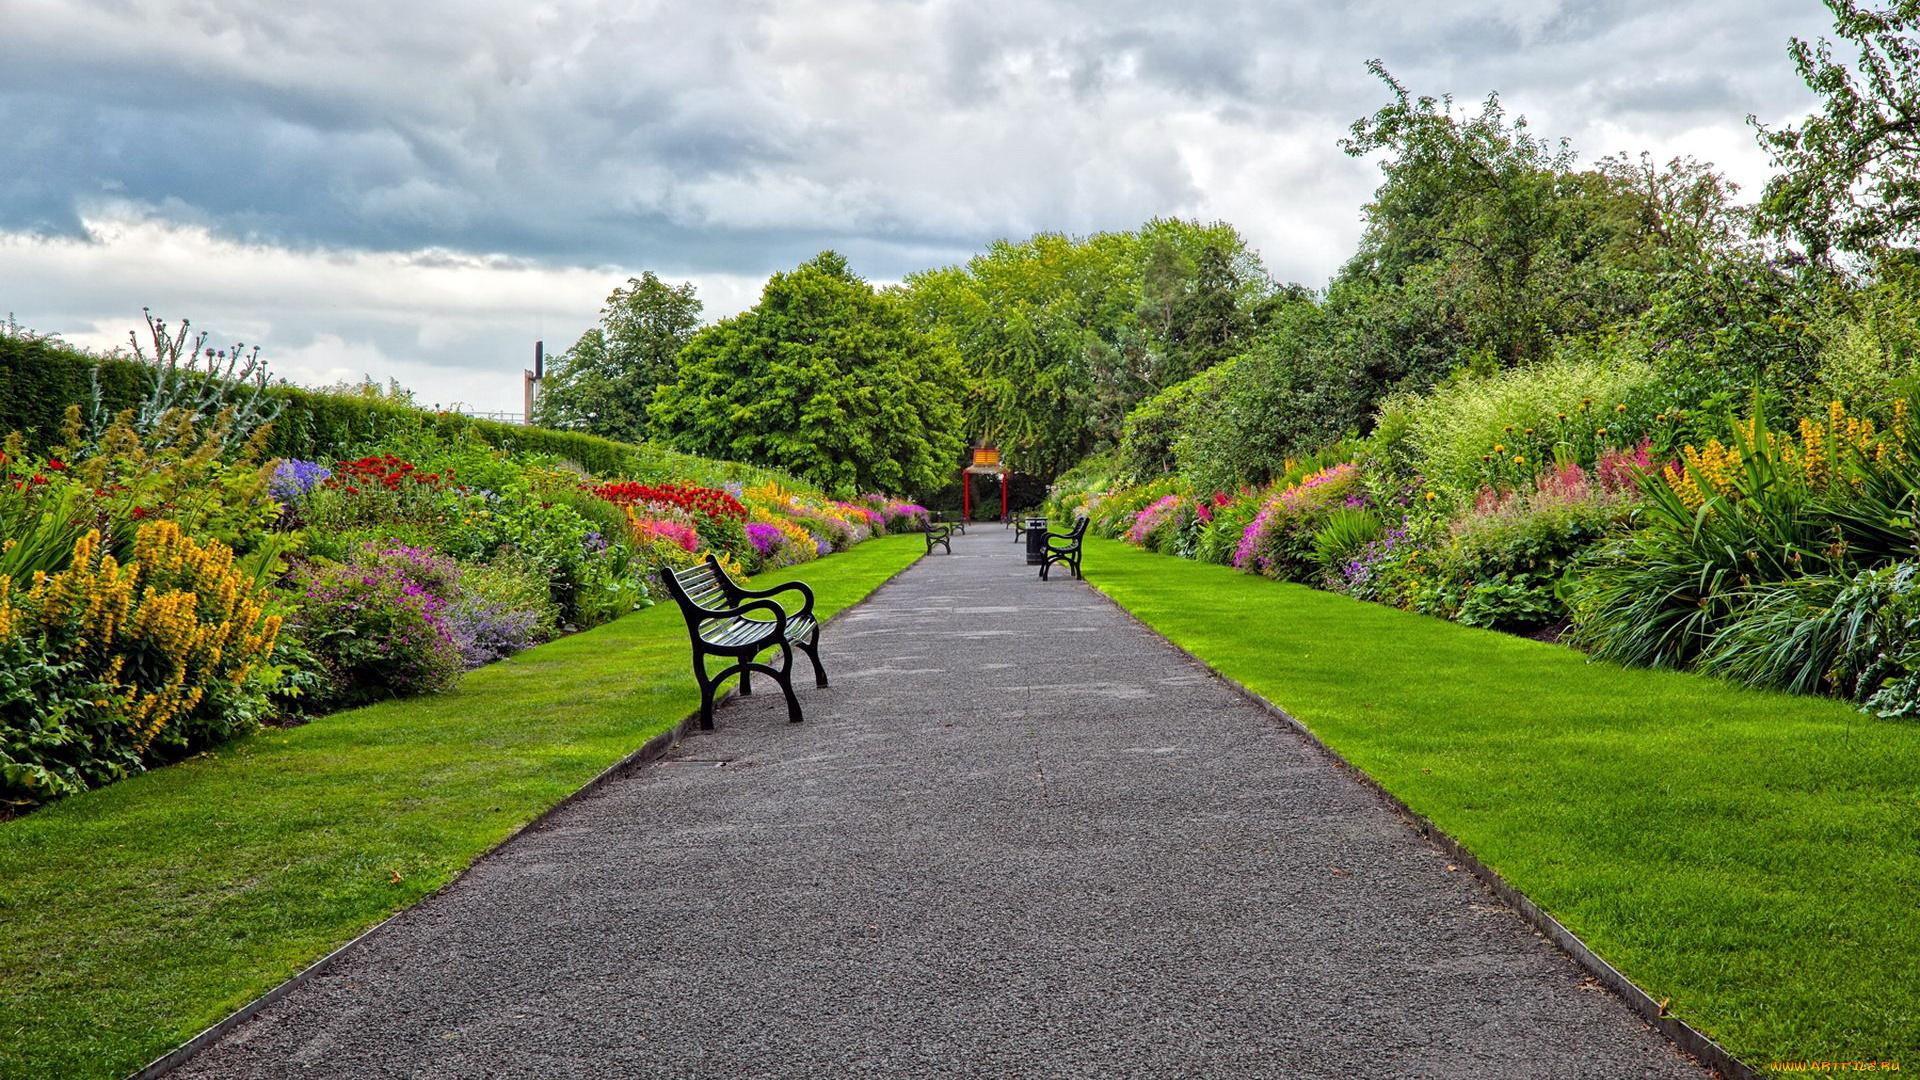 Цветы вдоль тропинки, Англия онлайн